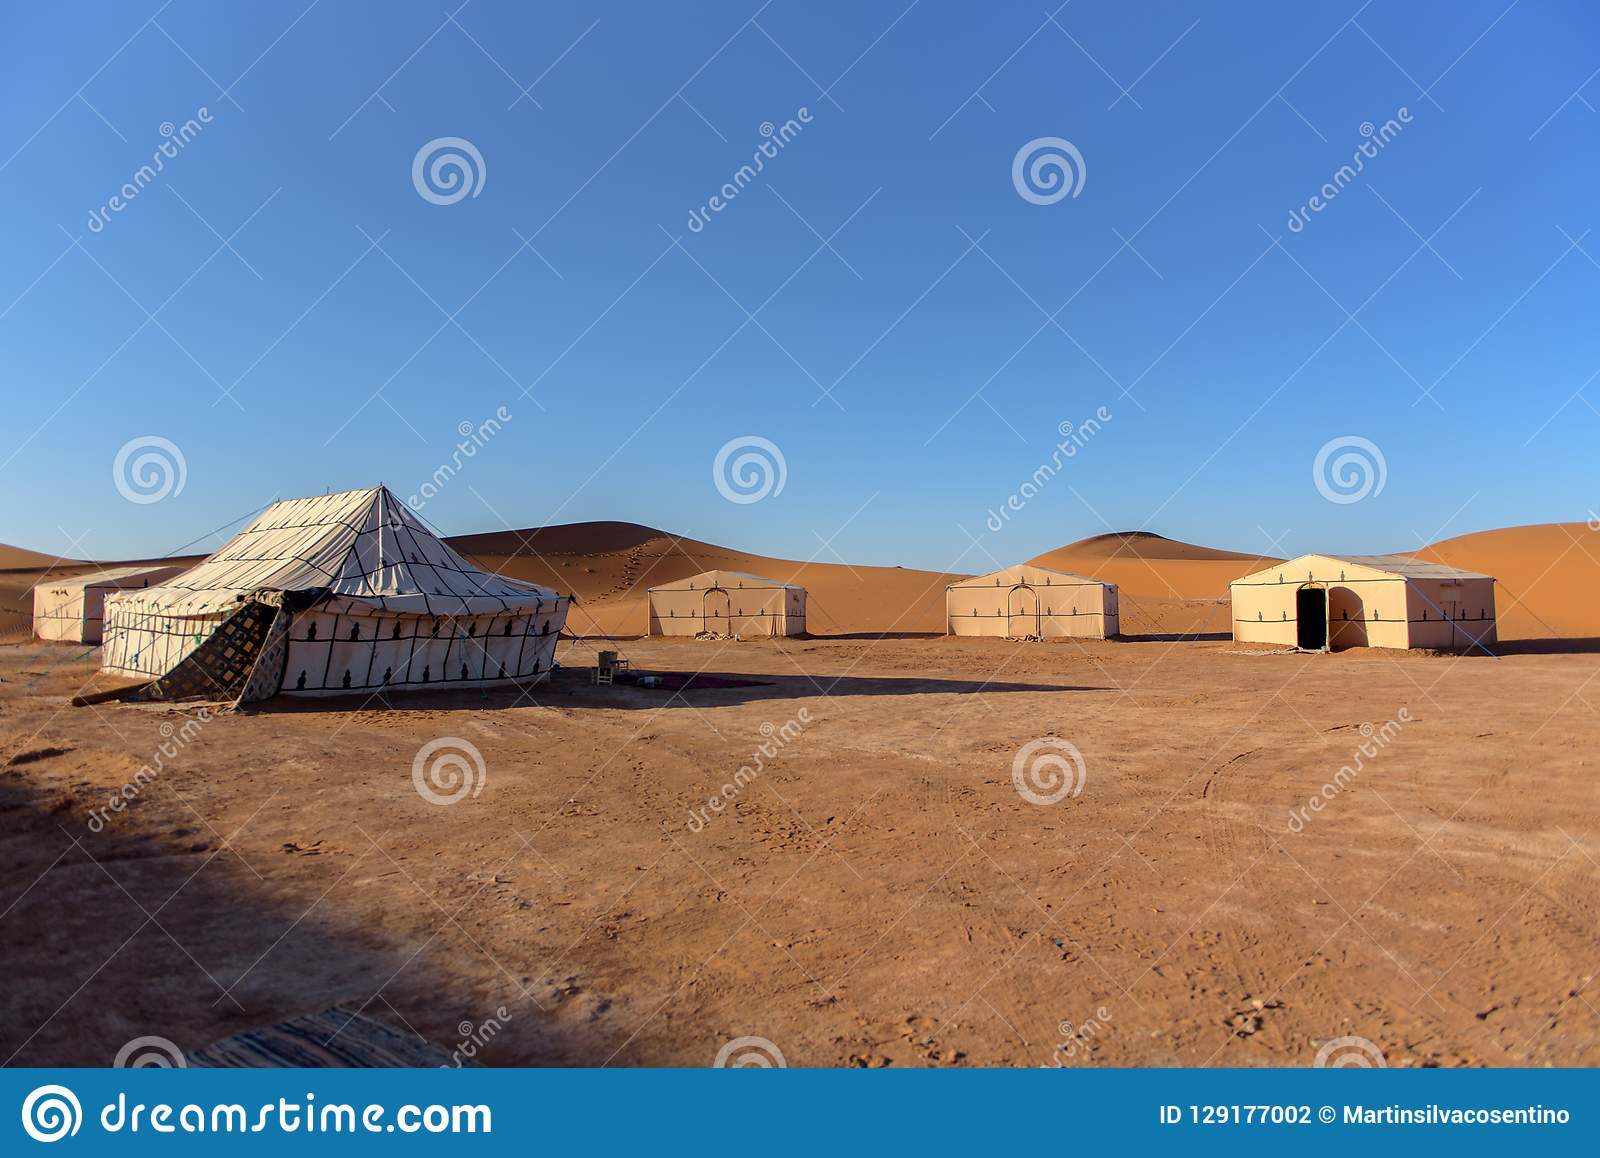 Kamp in de oase, Erg Gegaga, Morroco